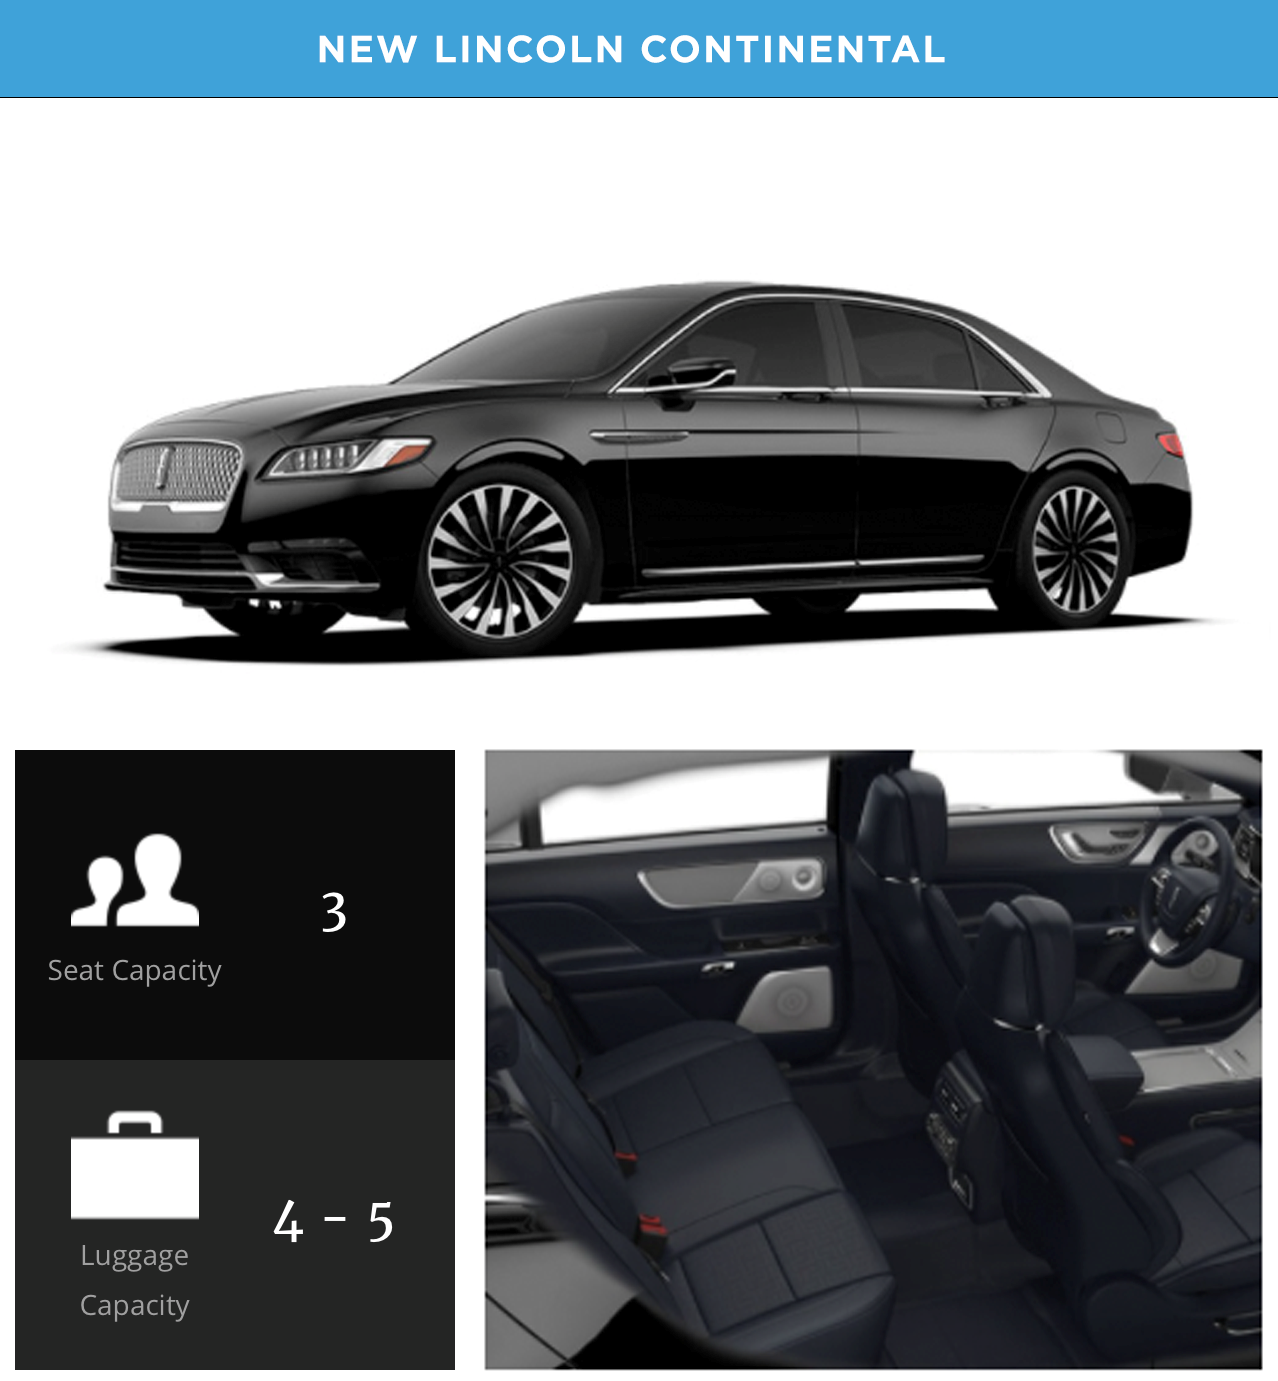 New Lincoln Continental copy